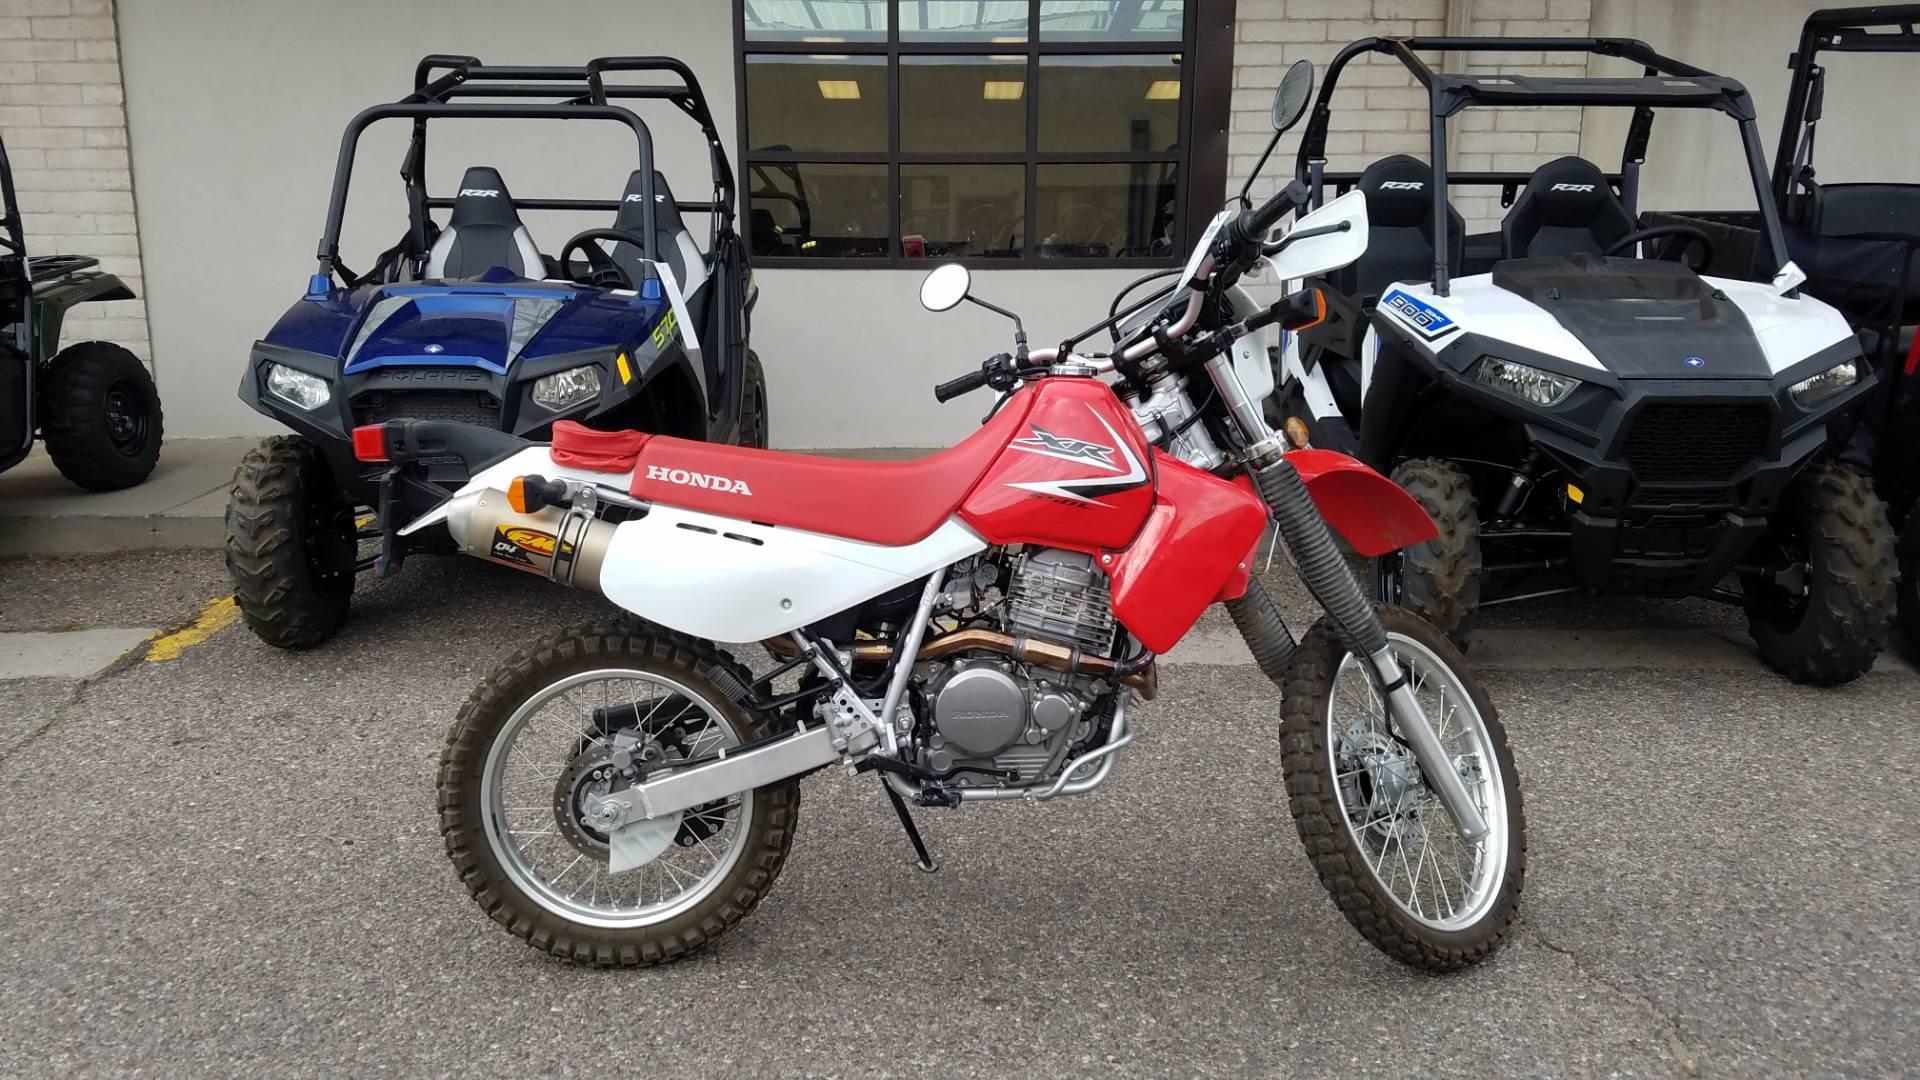 Used 2009 Honda XR™650L Motorcycles in Albuquerque, NM